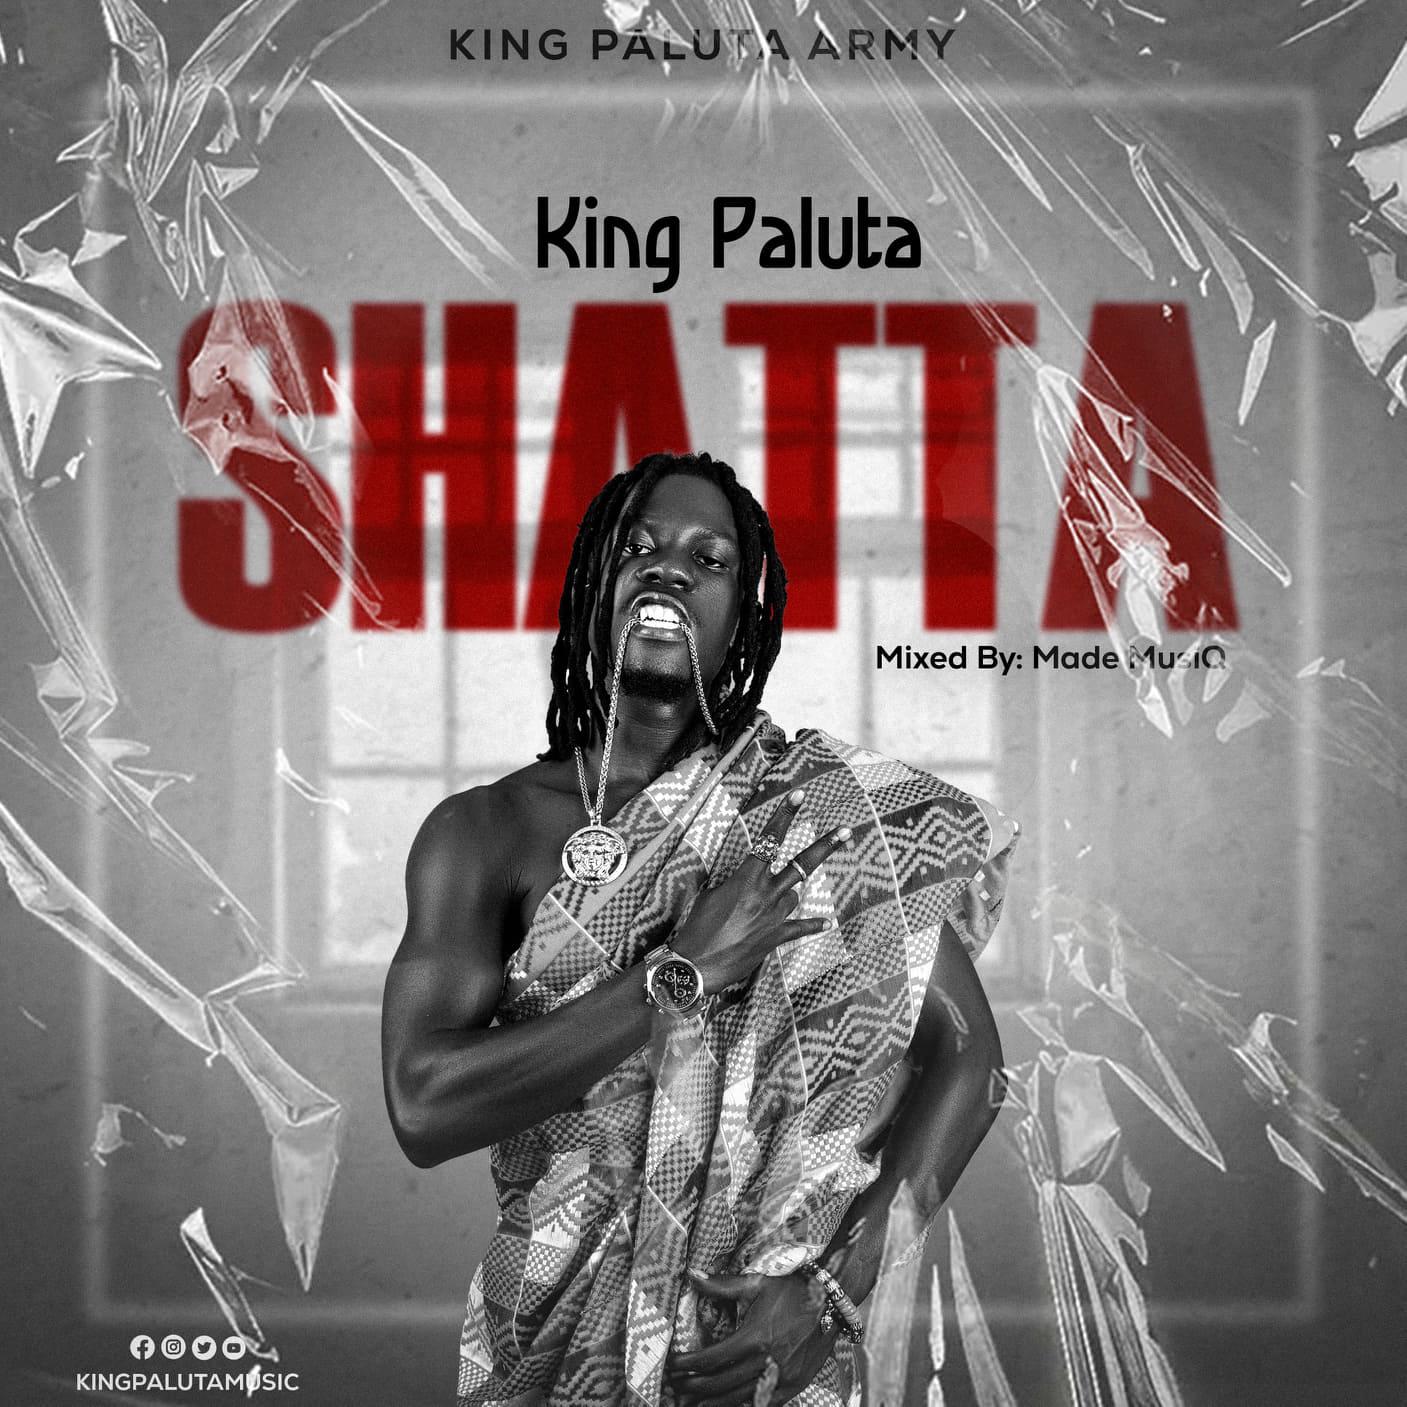 King Paluta – Shatta